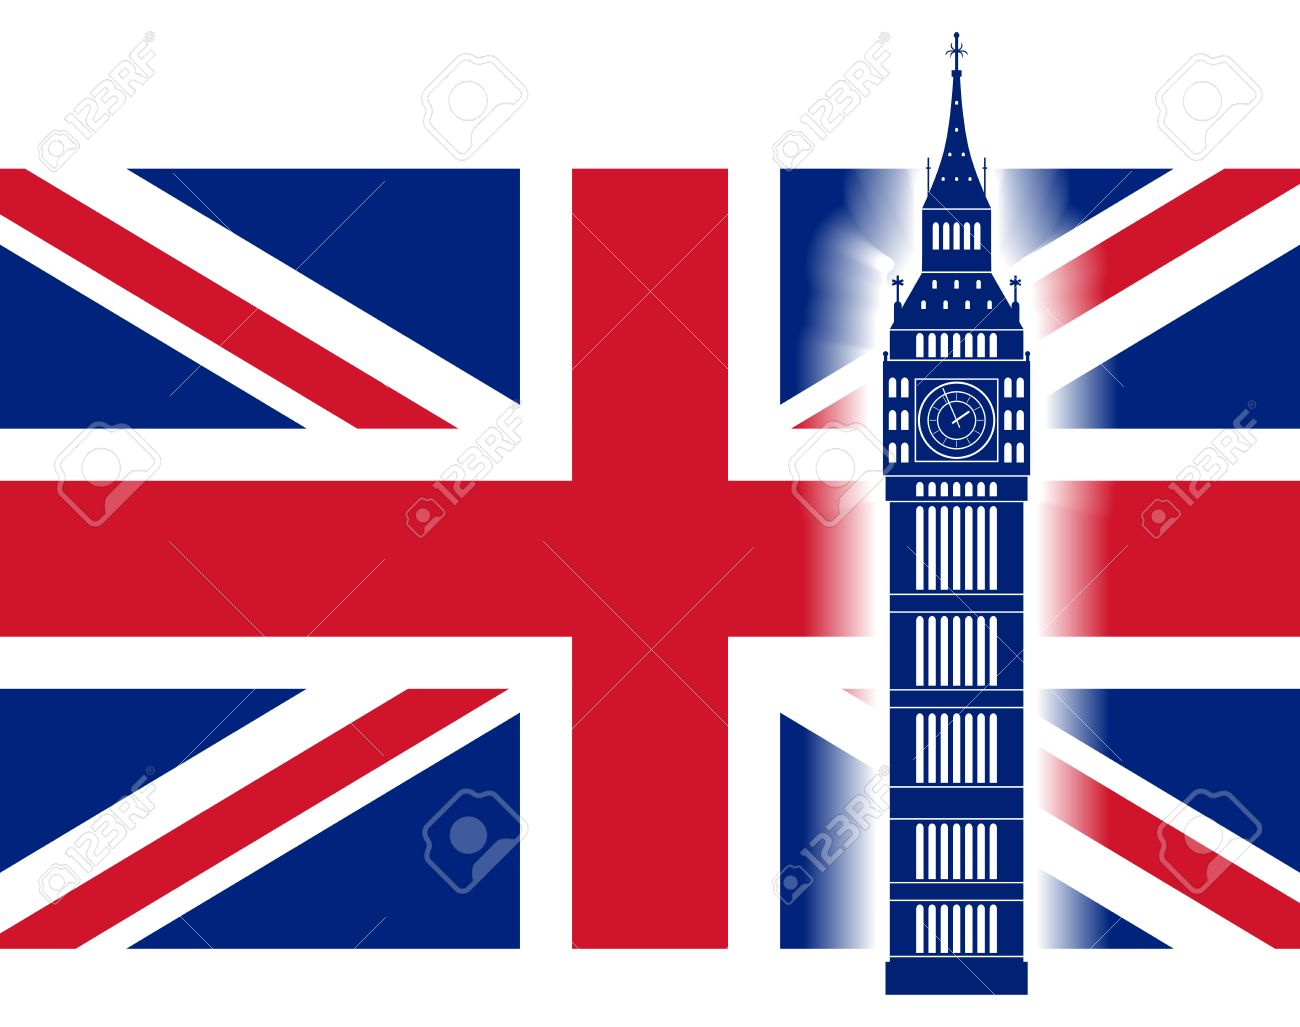 1300x1027 Big Ben On Background Of Great Britain Flag. British Union Jack